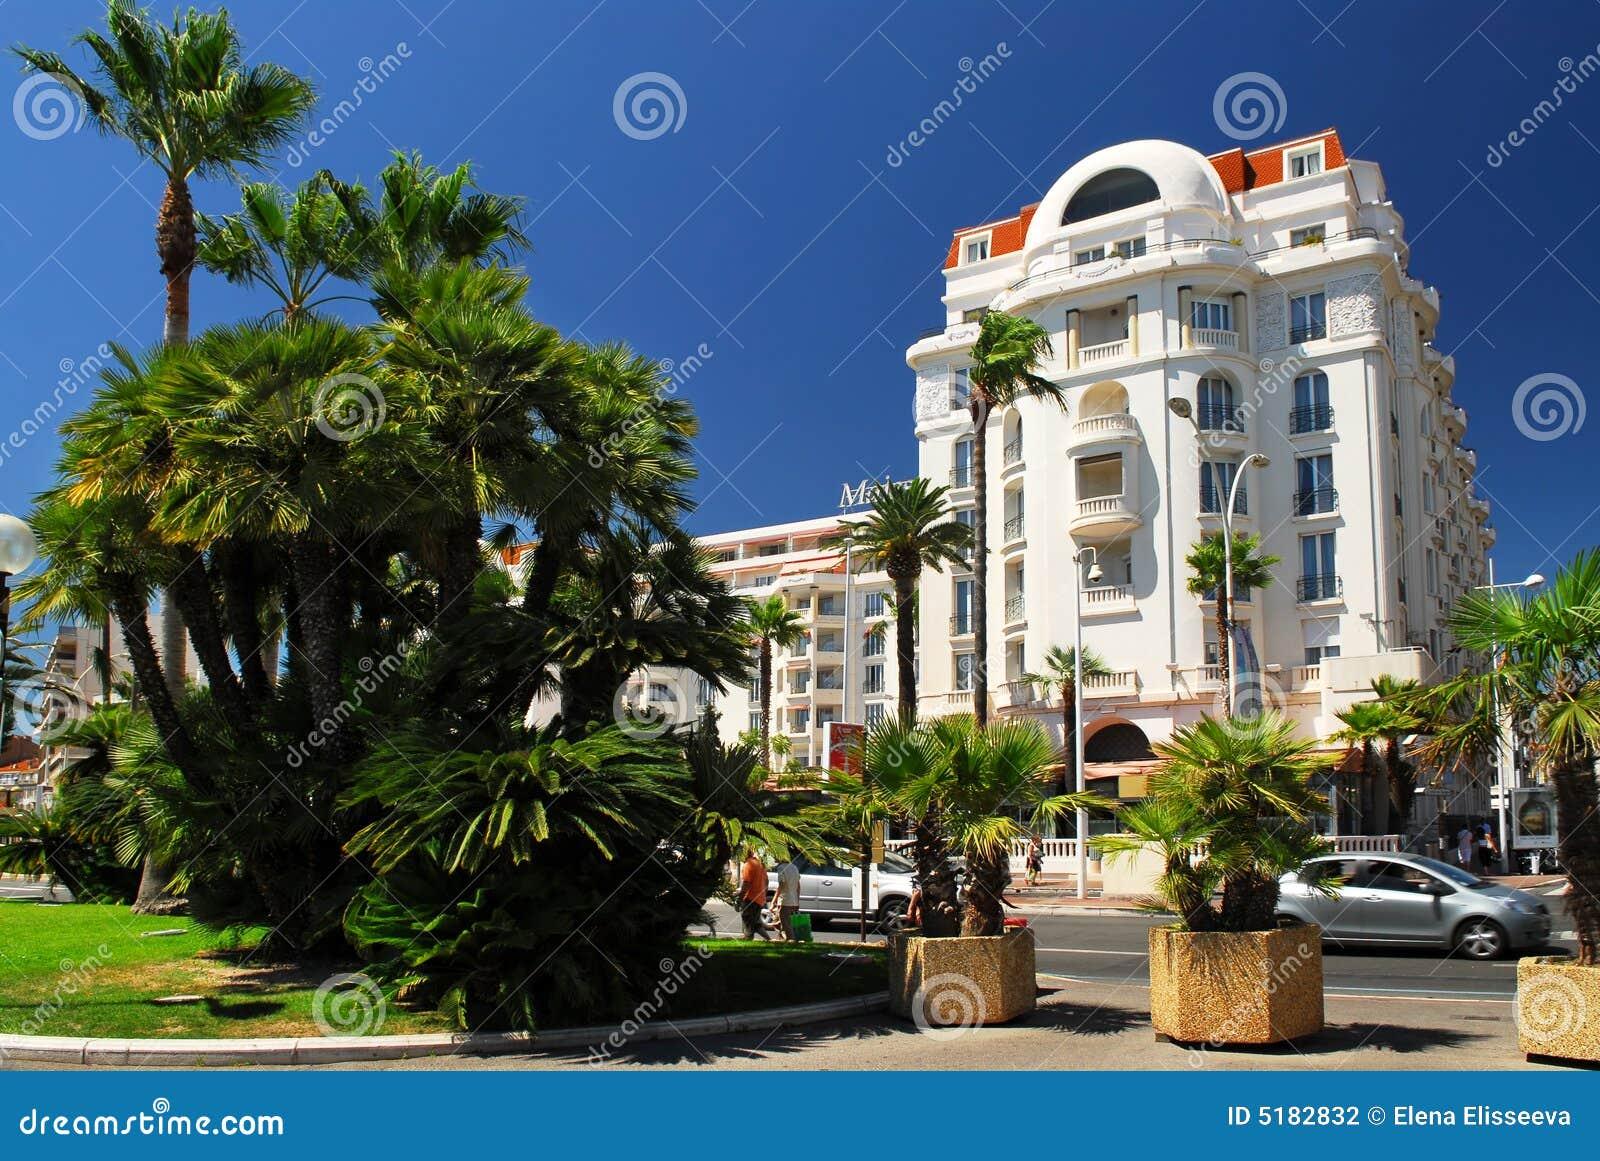 Cannes croisettepromenad